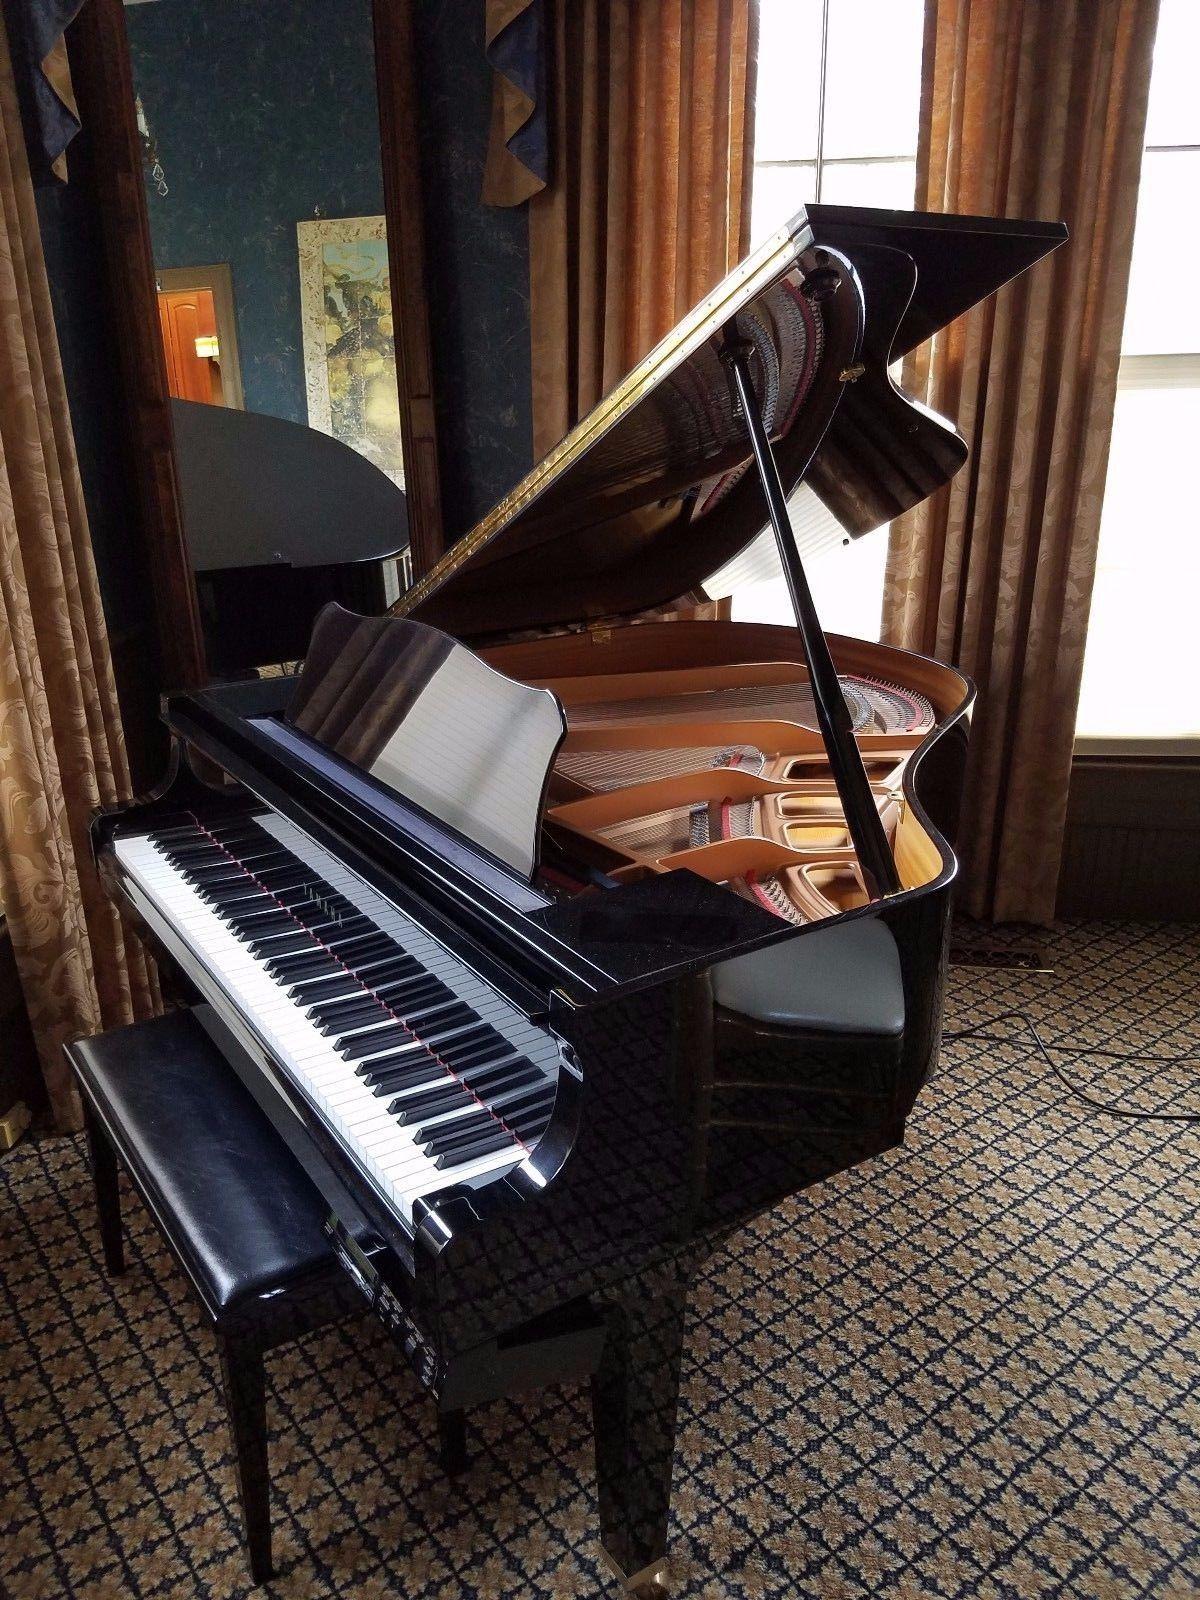 Yamaha Disklavier Classic Baby Grand Piano Dgp1xg Excellent Condition Baby Grand Pianos Grand Piano Piano